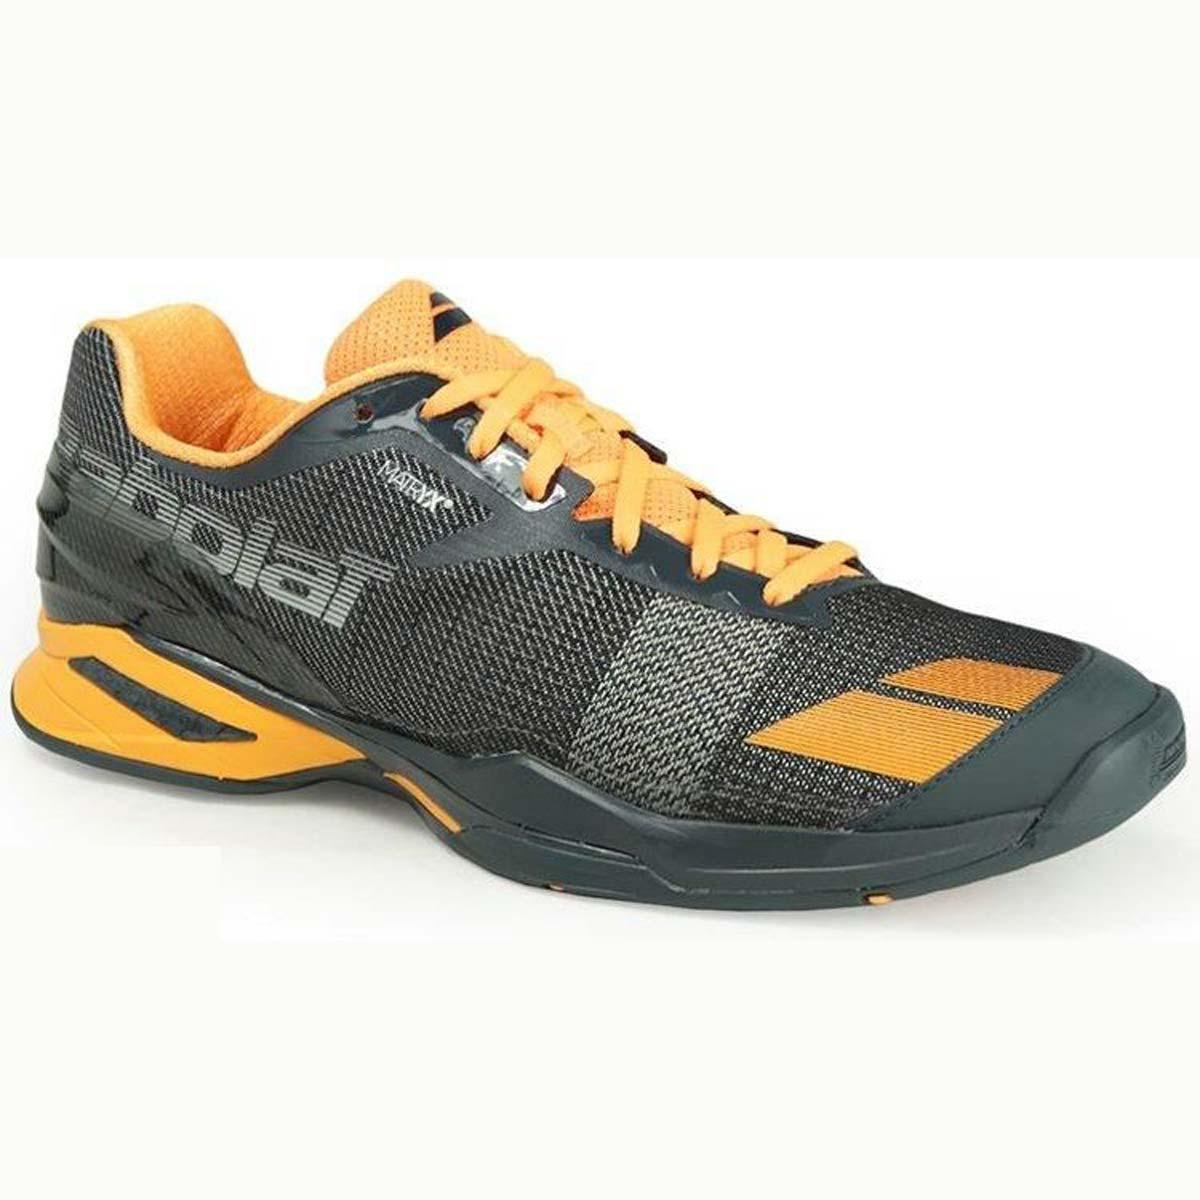 meet 87a09 9036d Babolat Jet All Court Mens Tennis Shoes(GreyOrange